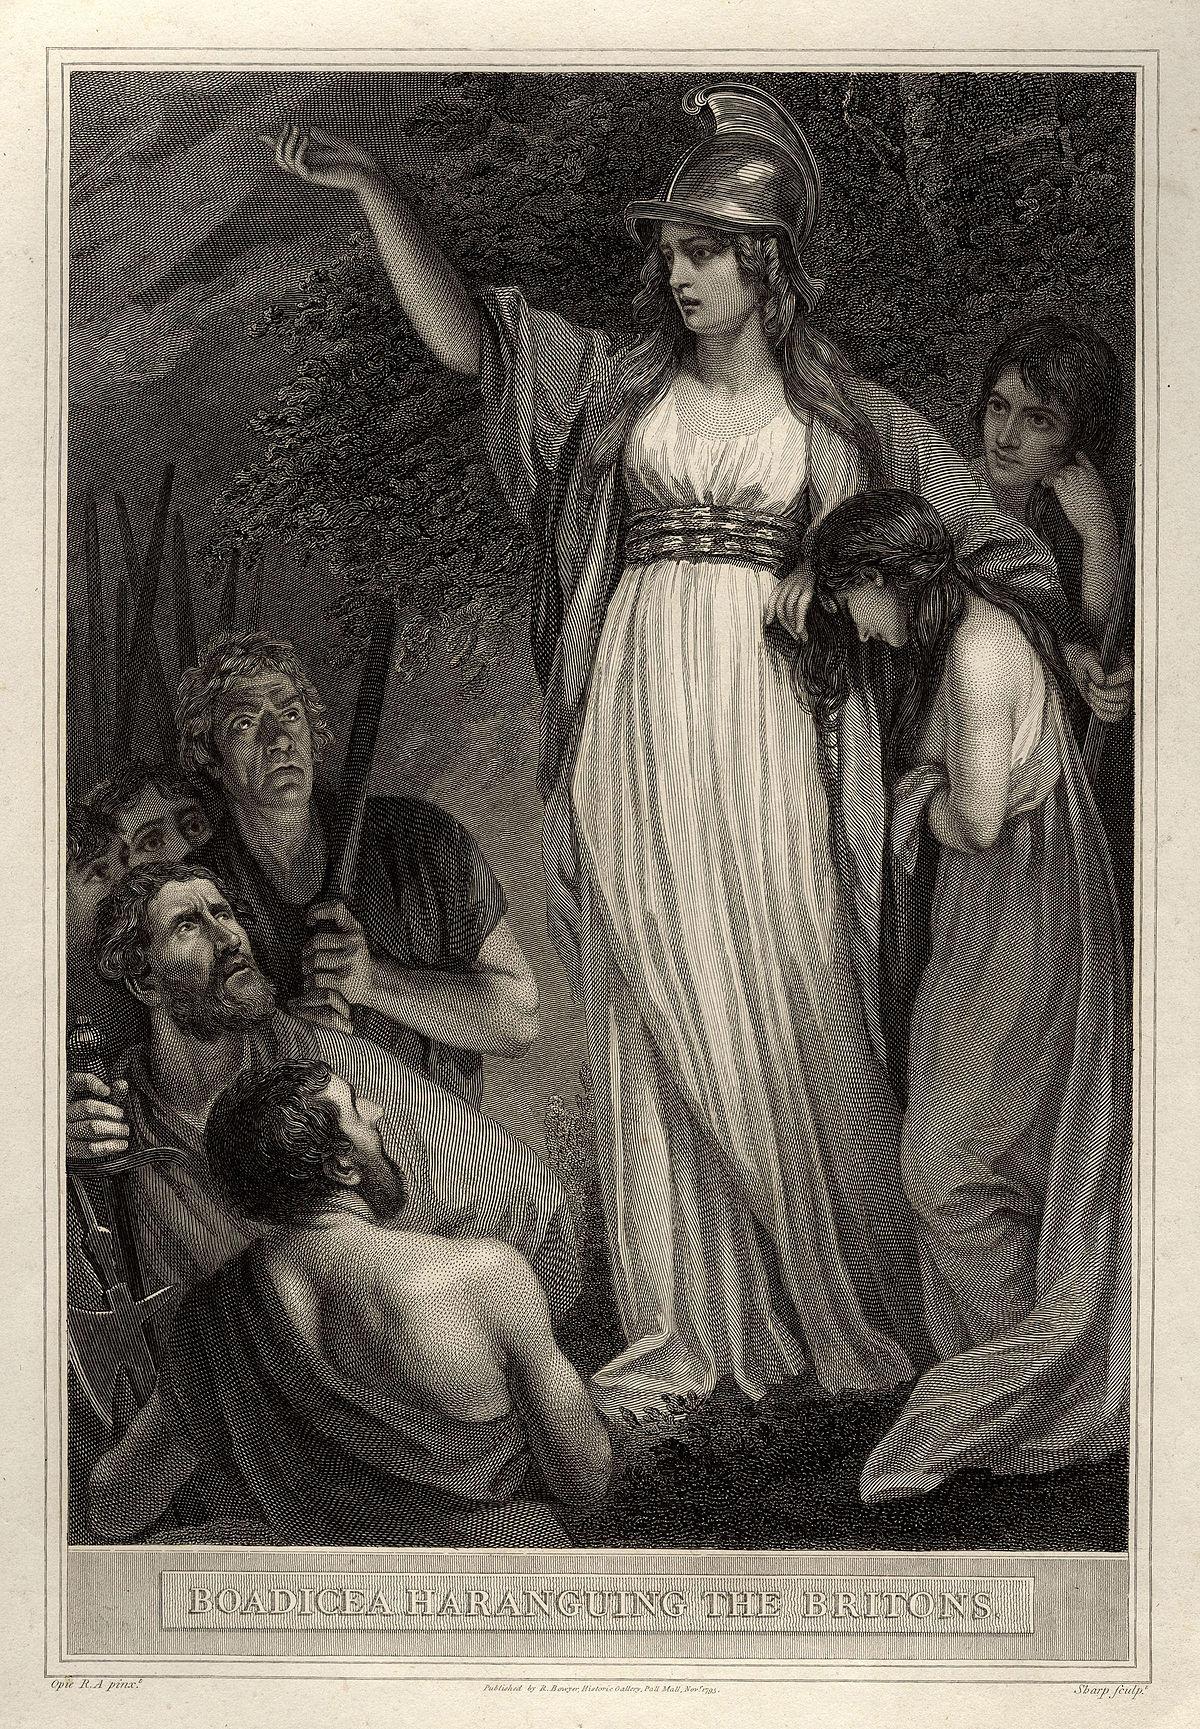 The Celtic Tarot Courtney Davis 9780850309201 Amazon: Simple English Wikipedia, The